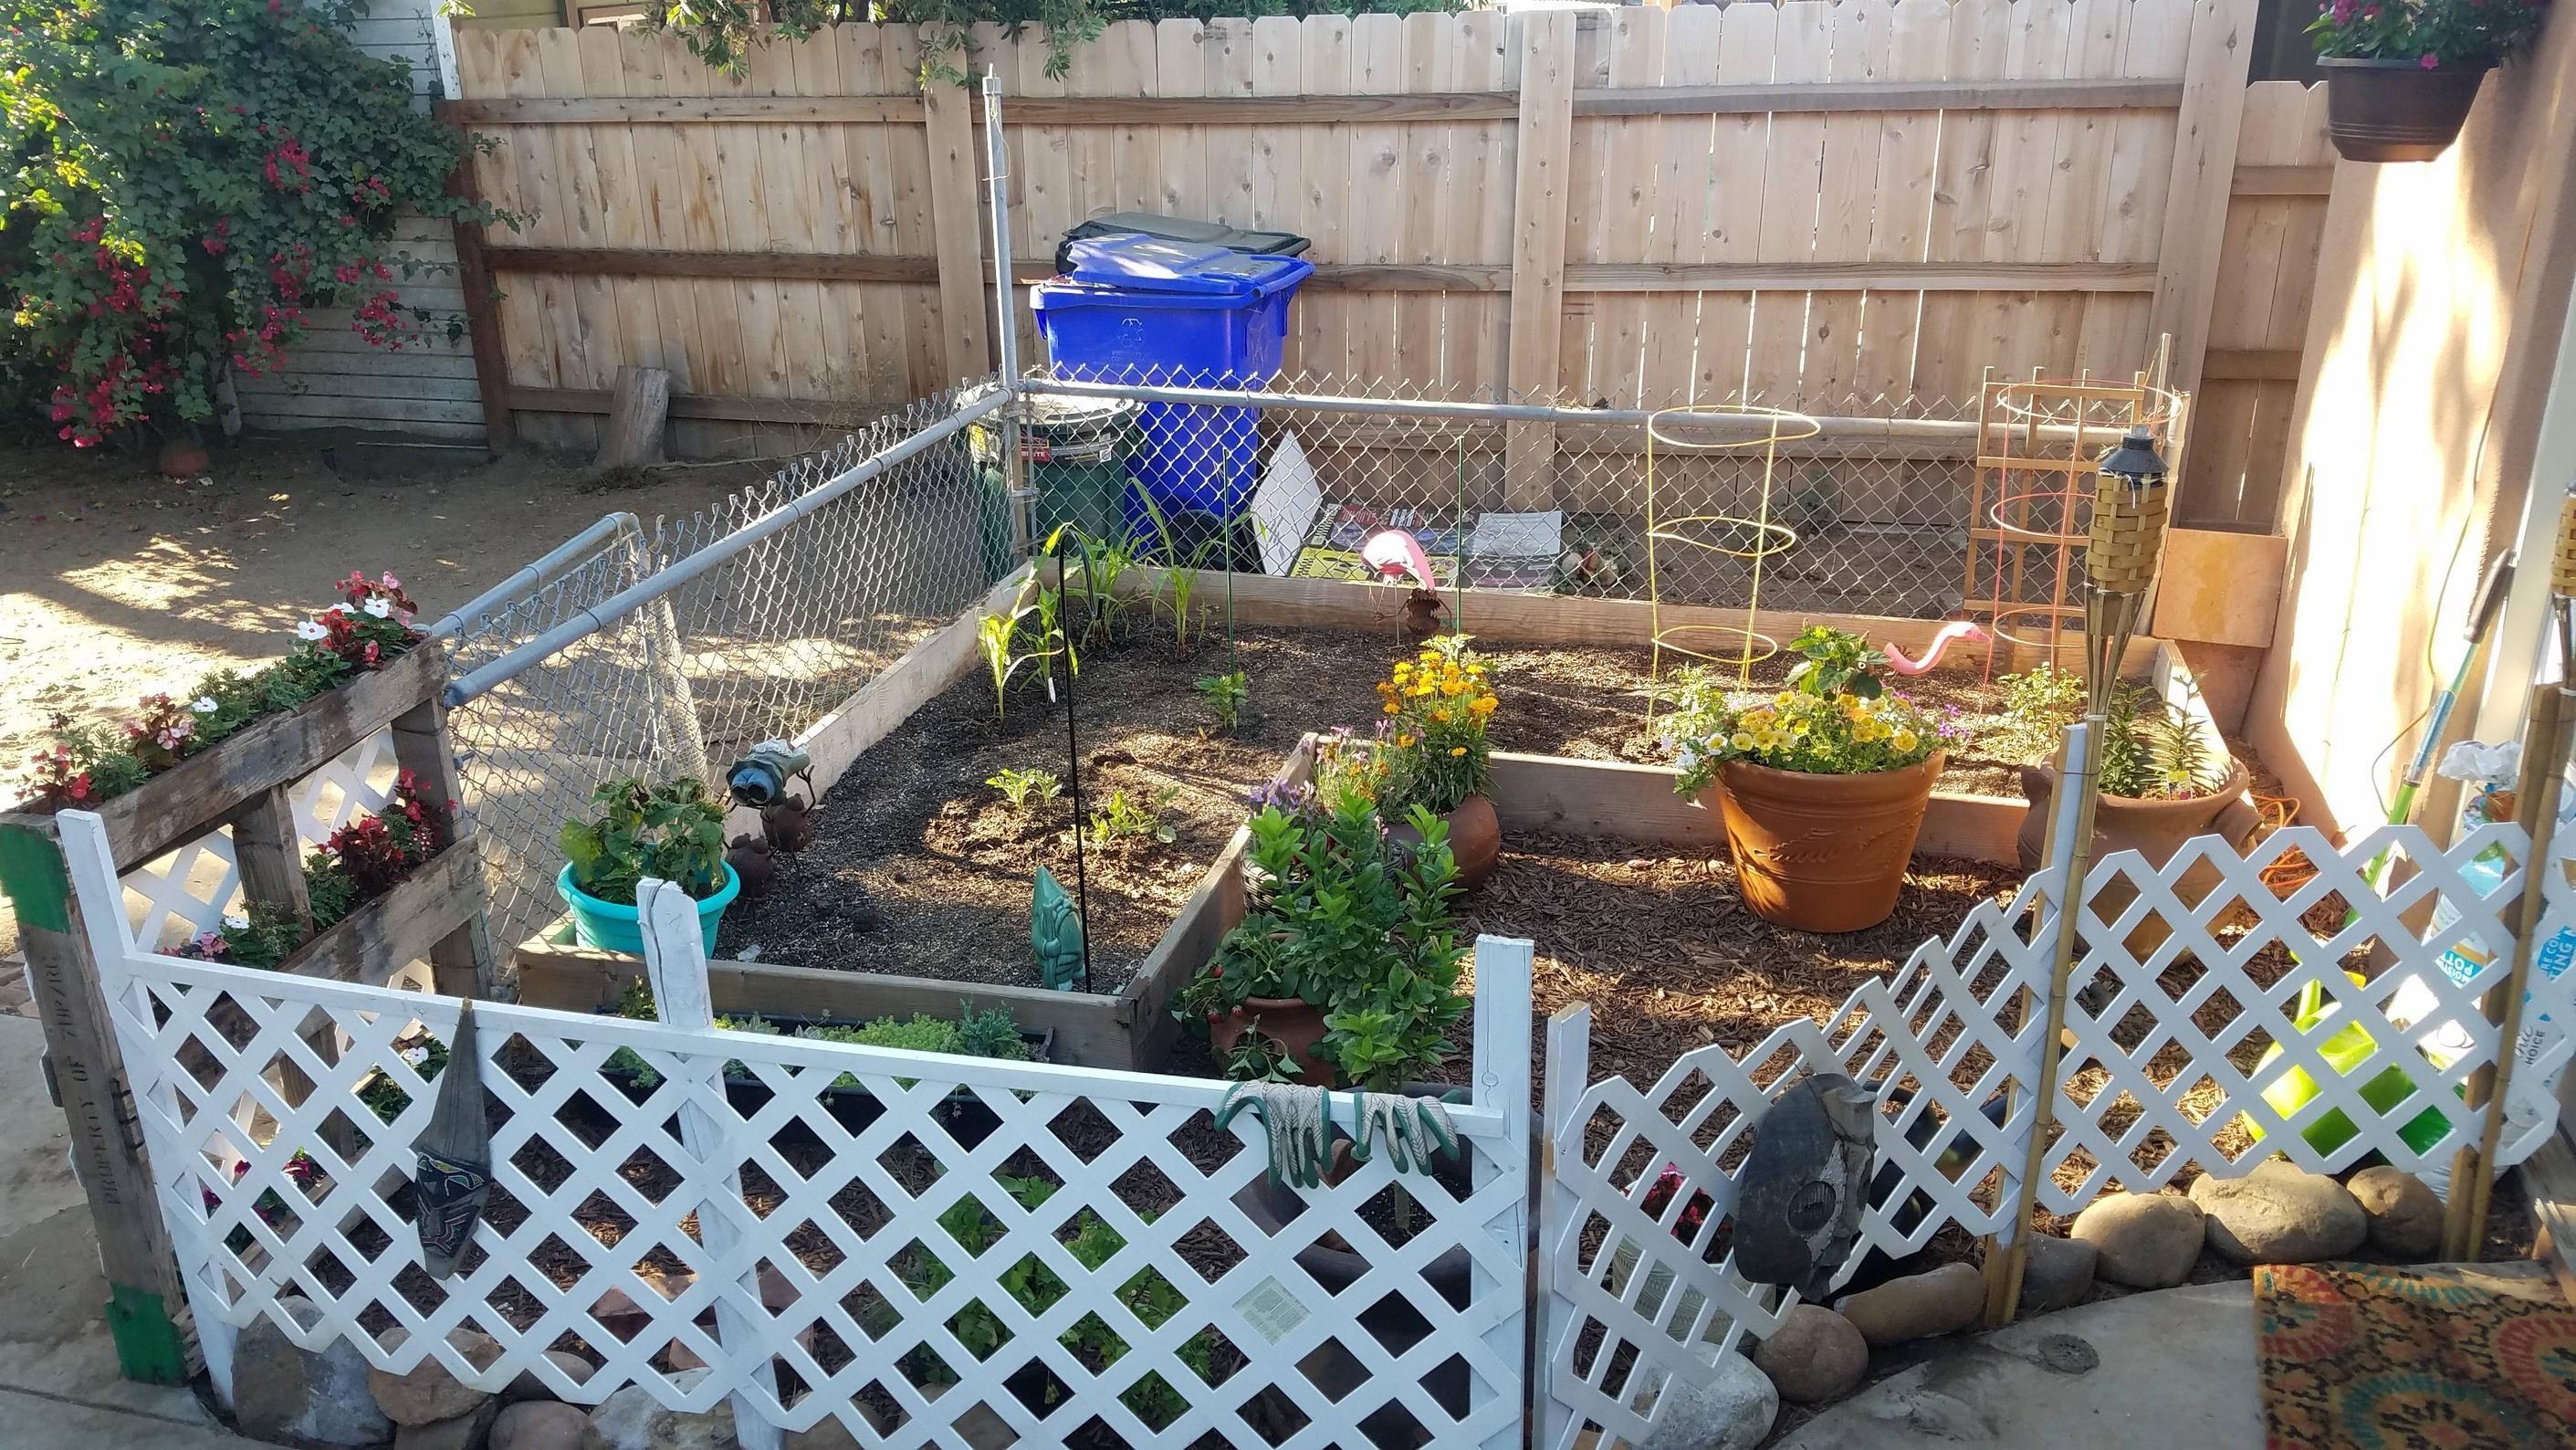 Dogproof gardening gardening garden diy home